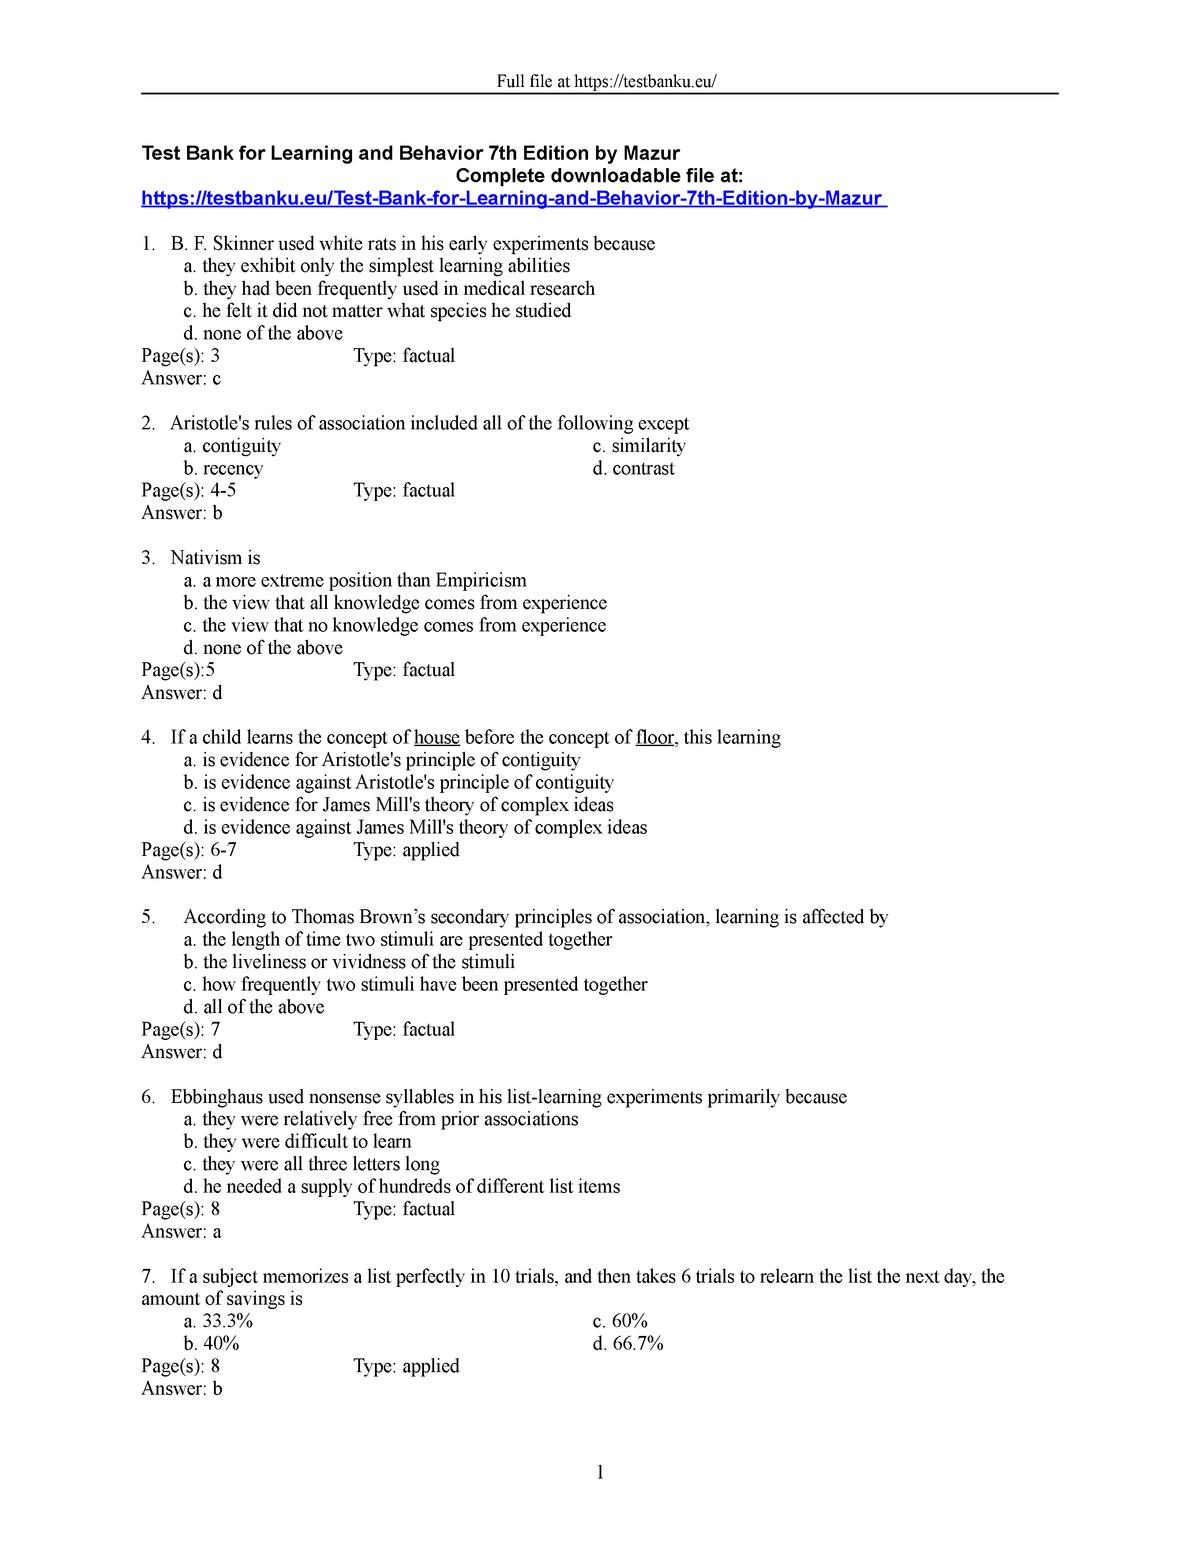 Exam 2018 - PSY236: Biopsychology and Learning - StuDocu